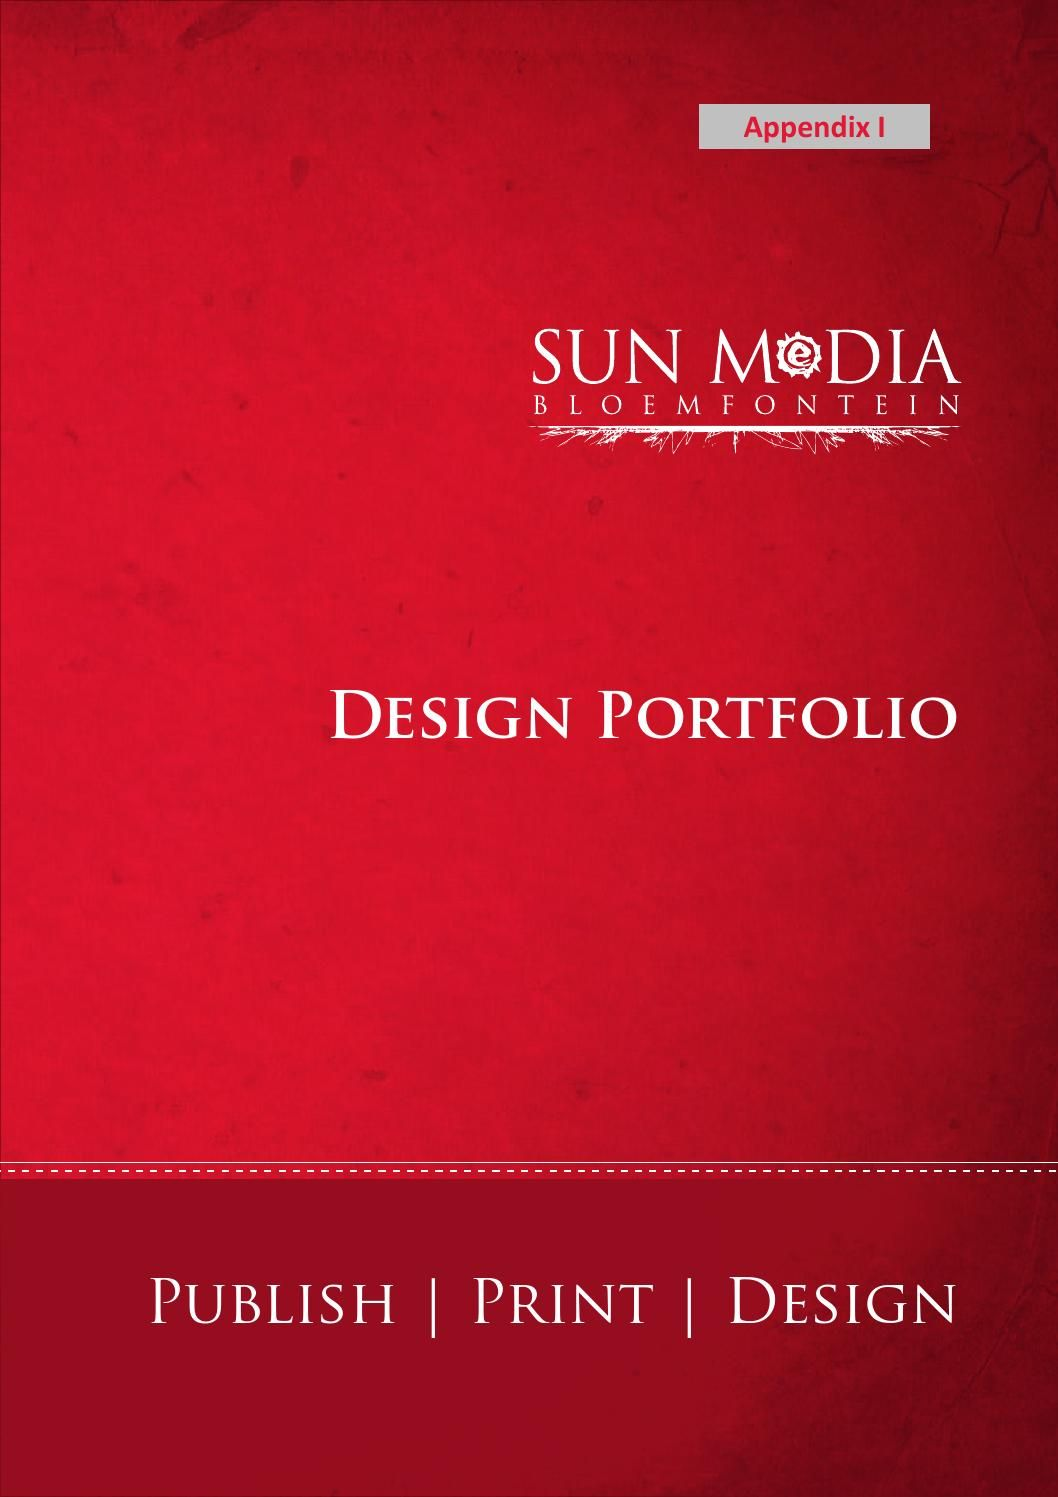 SUN MeDIA Bloemfontein Design Portfolio